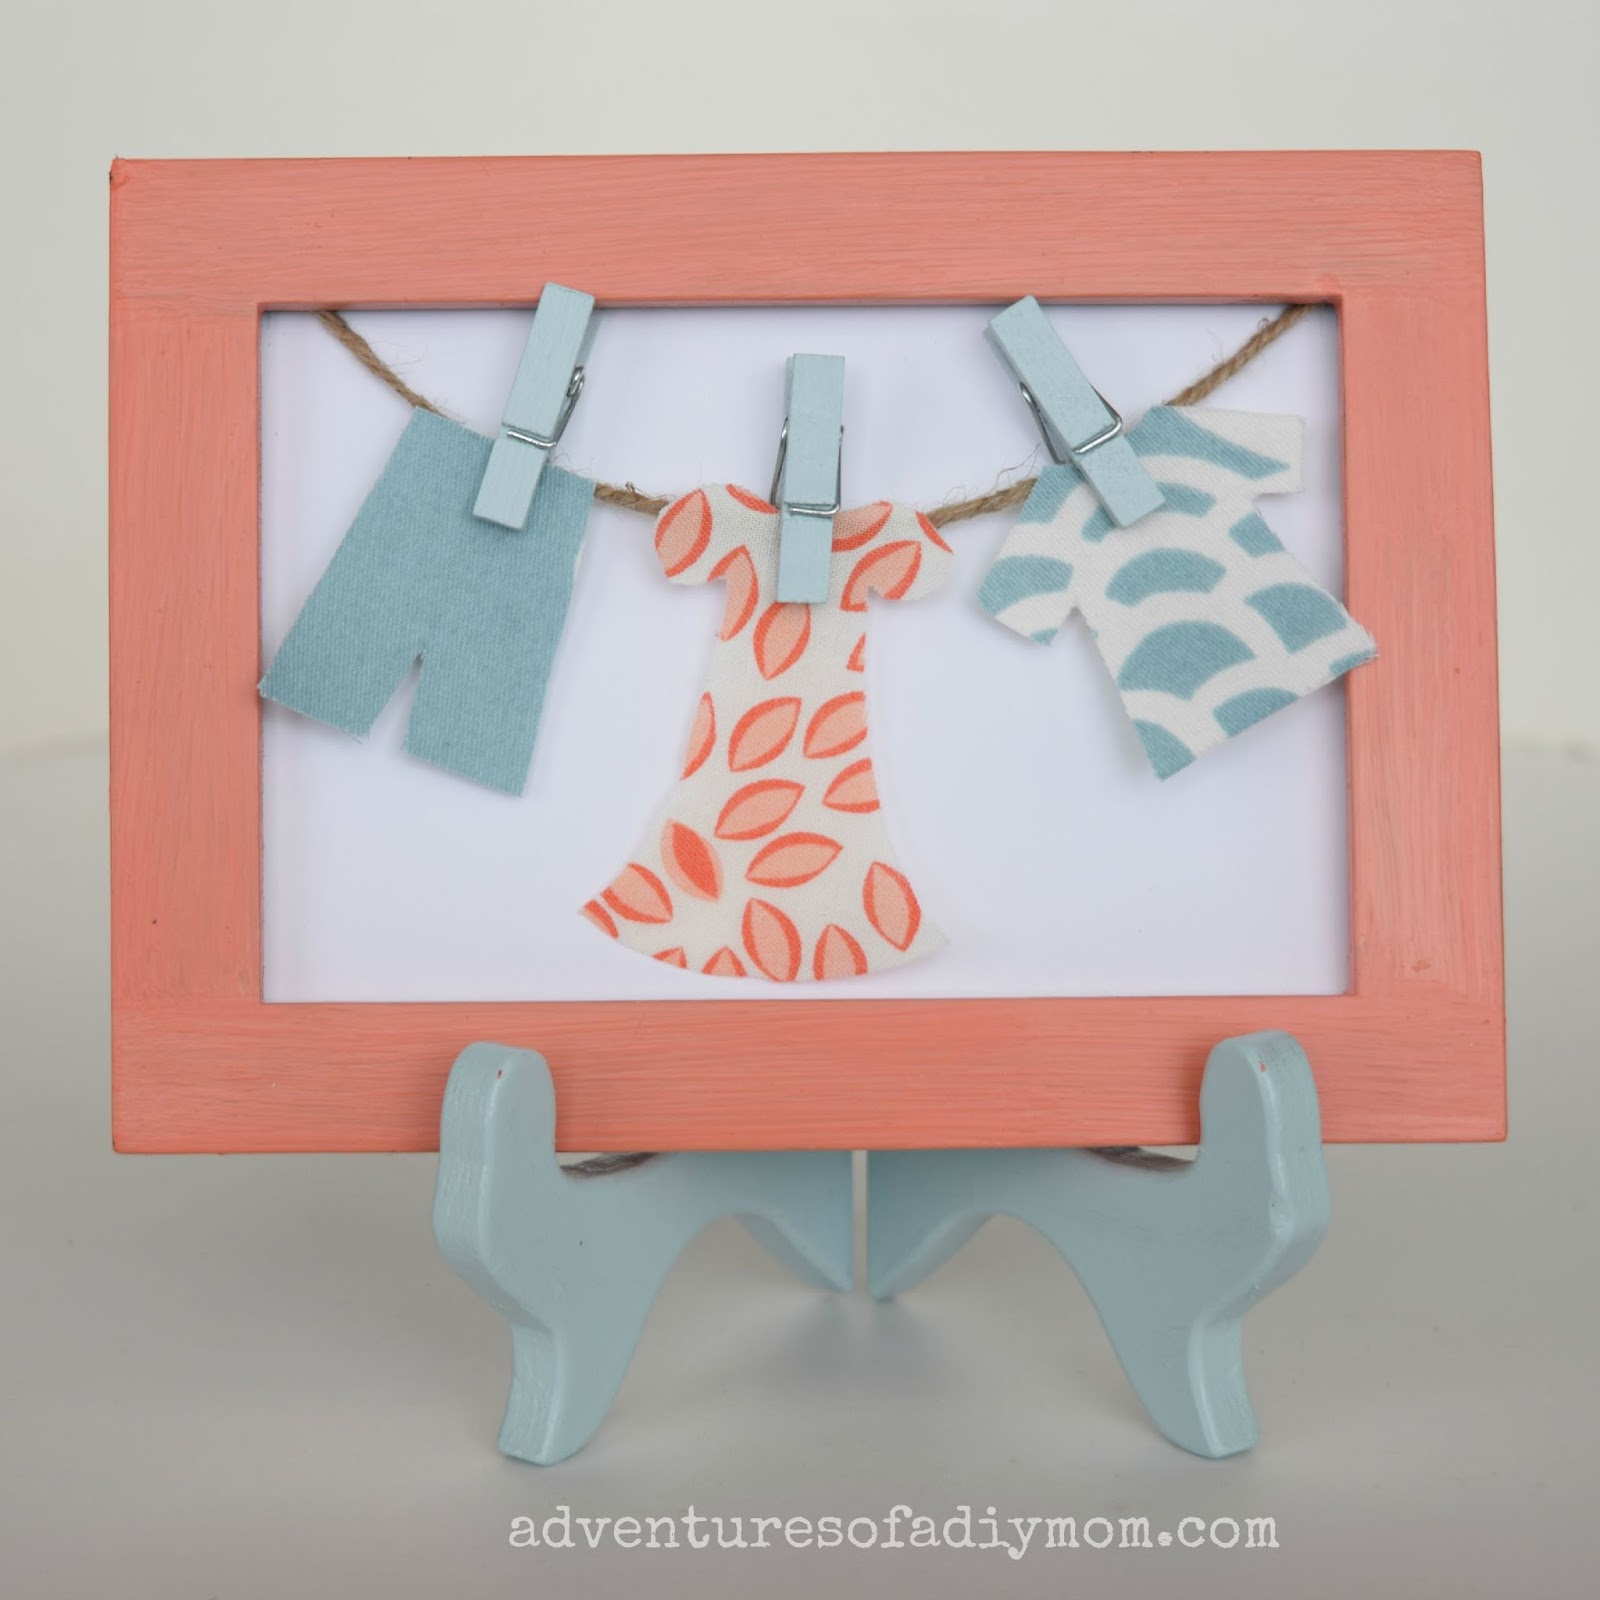 Clothesline Craft - Laundry Room Makeover - Adventures of a DIY Mom